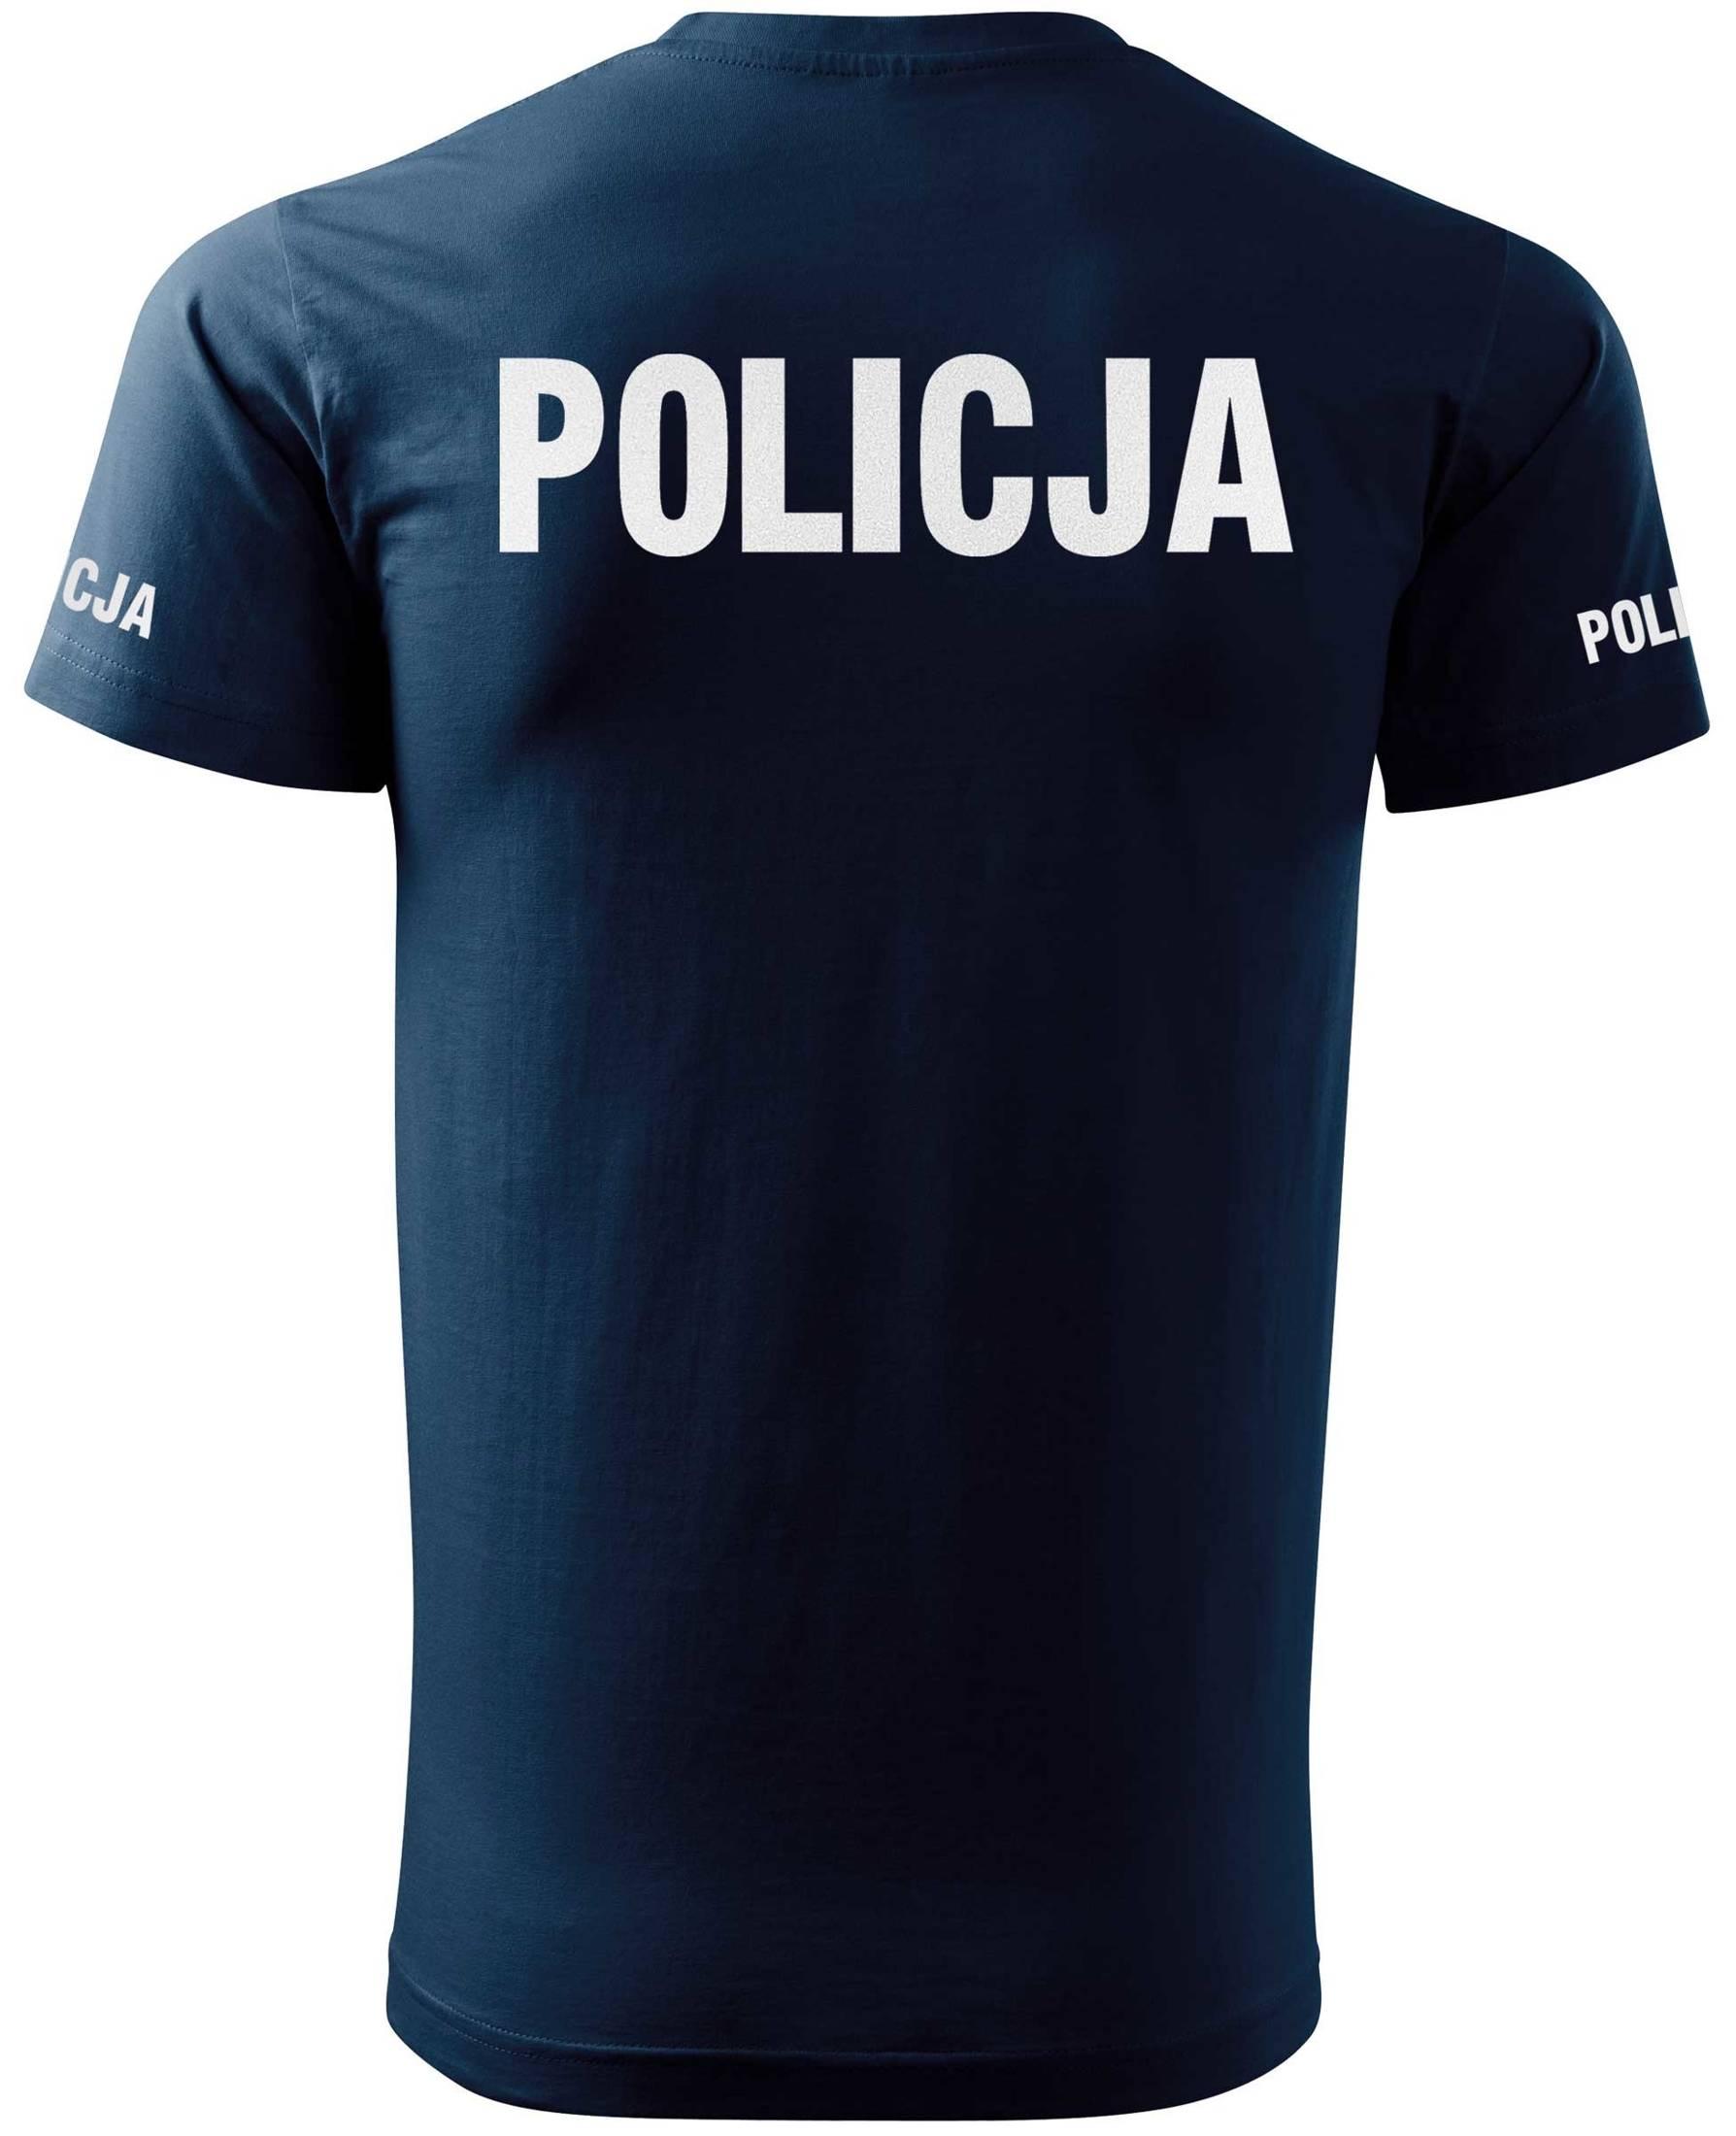 POLICJA koszulka z nadrukiem – HVR wear.pl  NLsA4